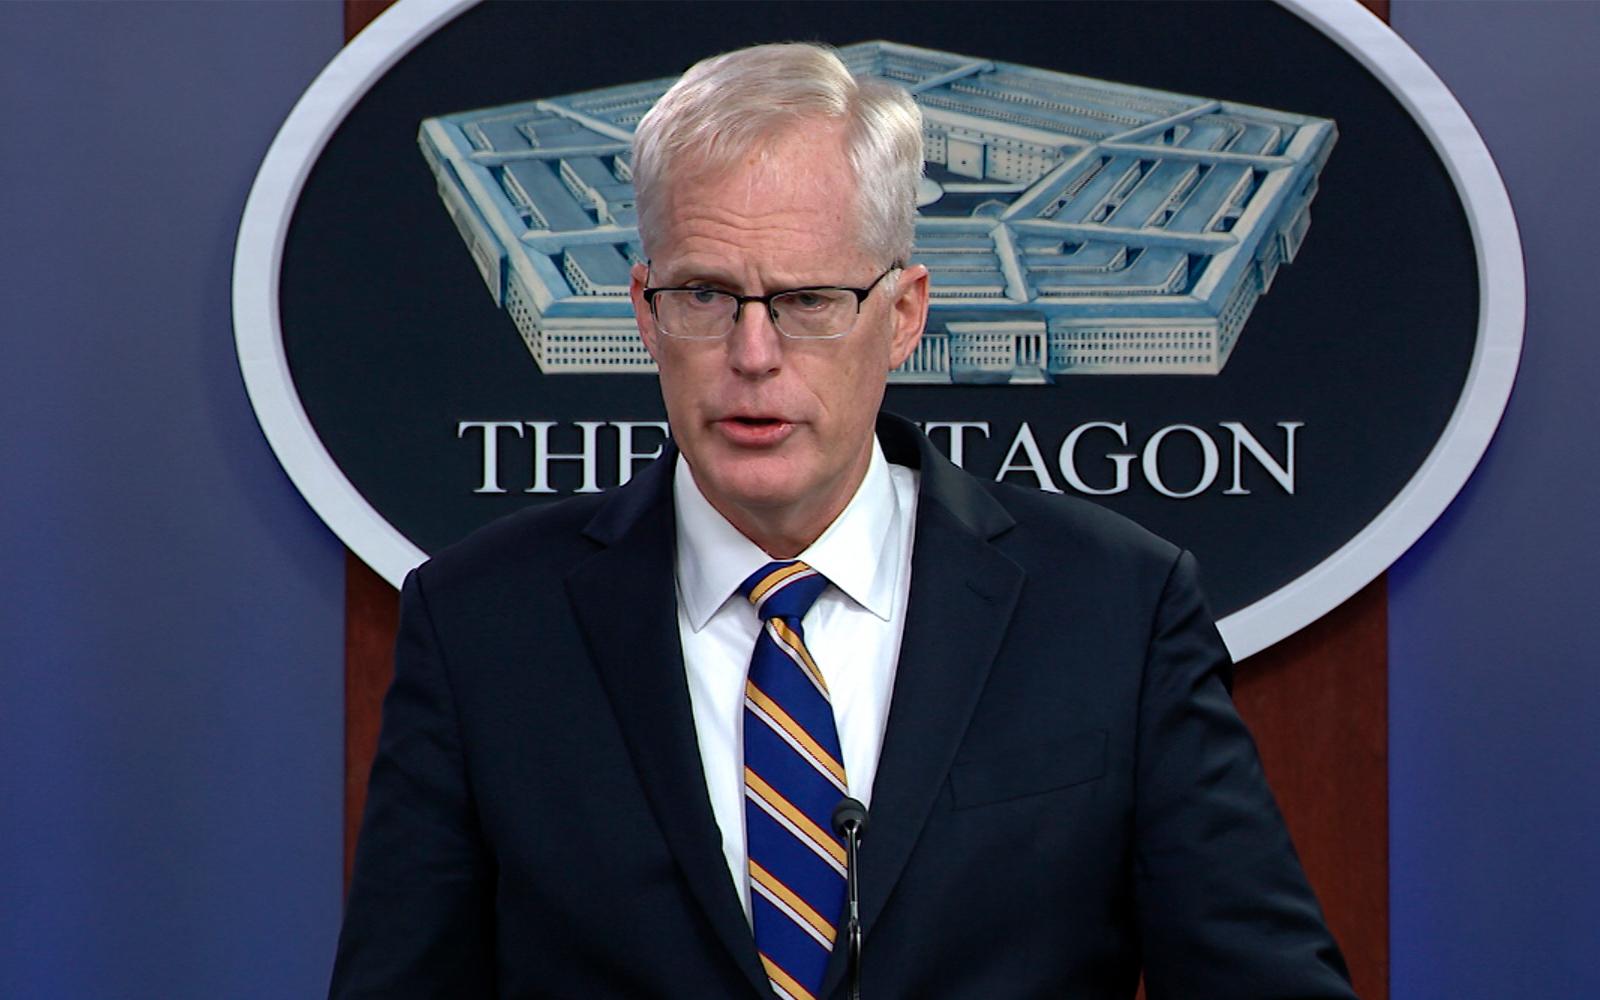 Acting US Defense Secretary Christopher Miller speaks at the Pentagon in Washington